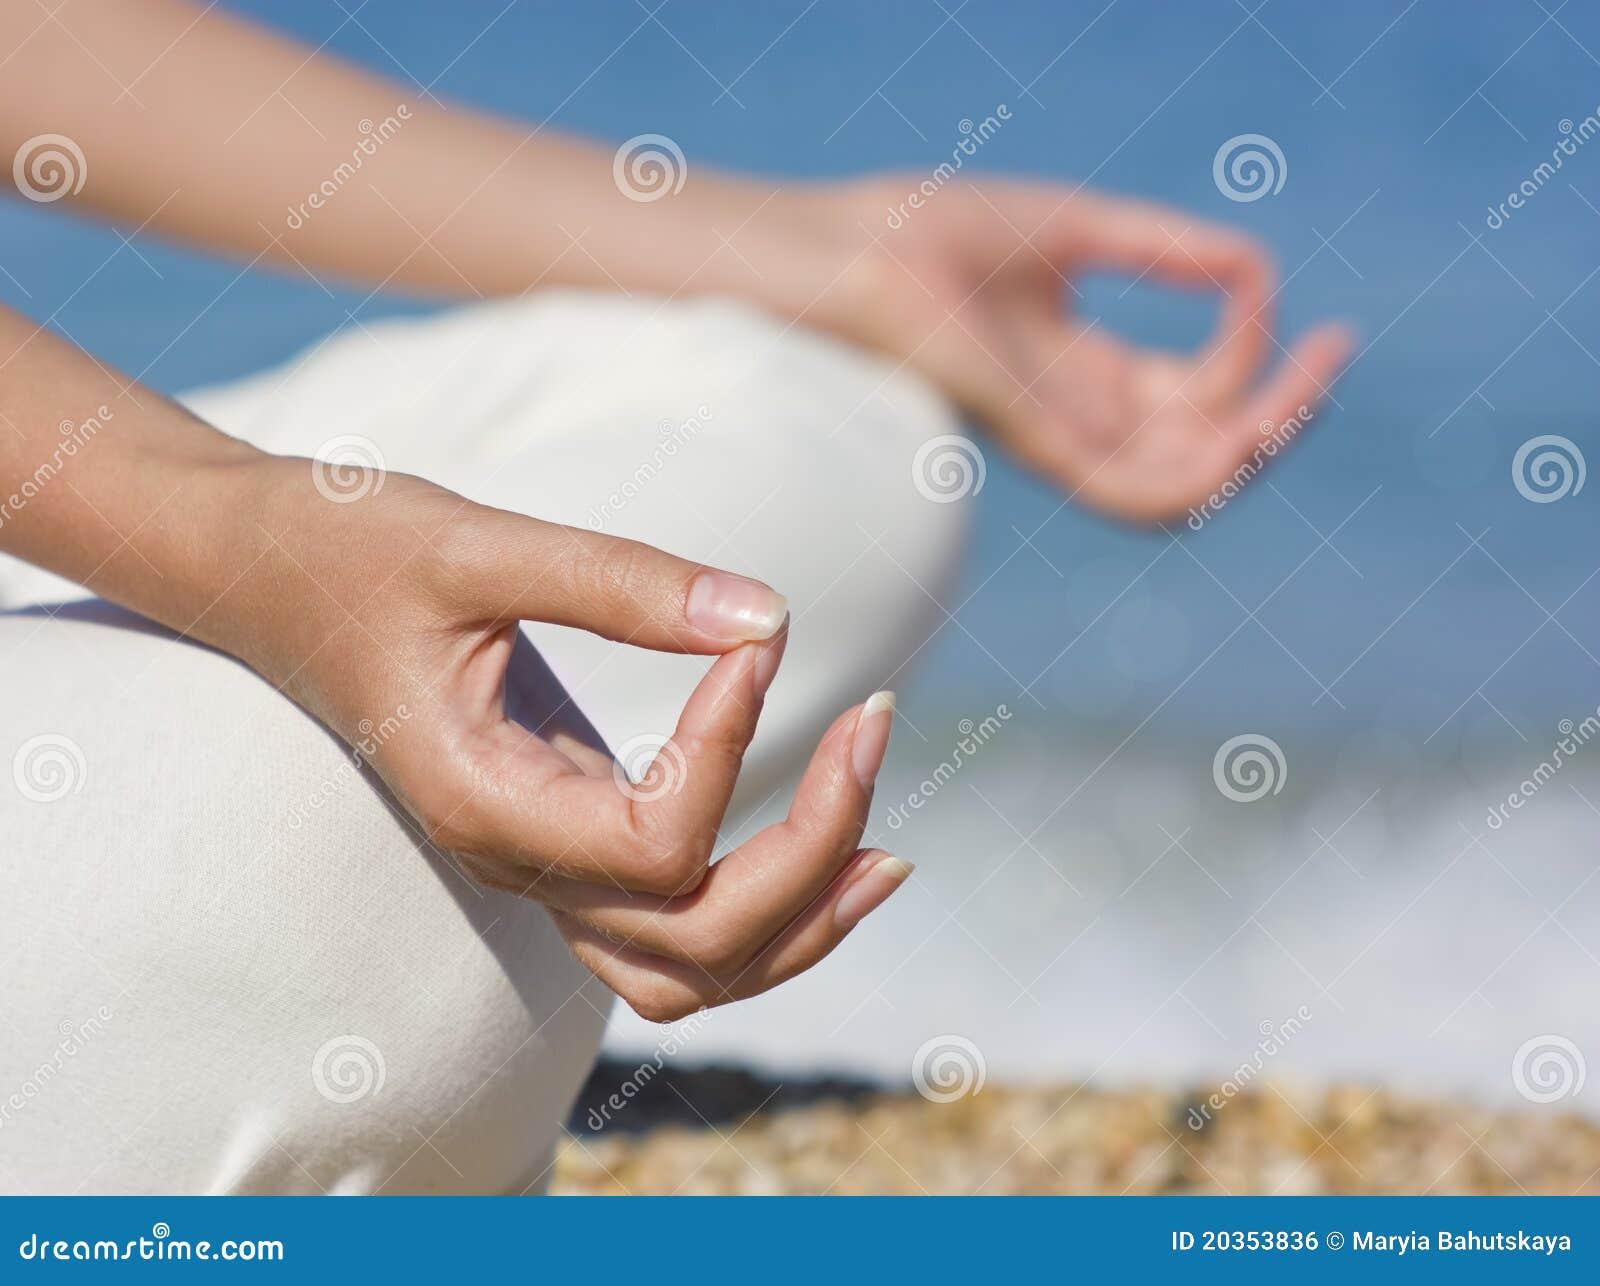 Yoga Hands on Mind Body Soul Spirit